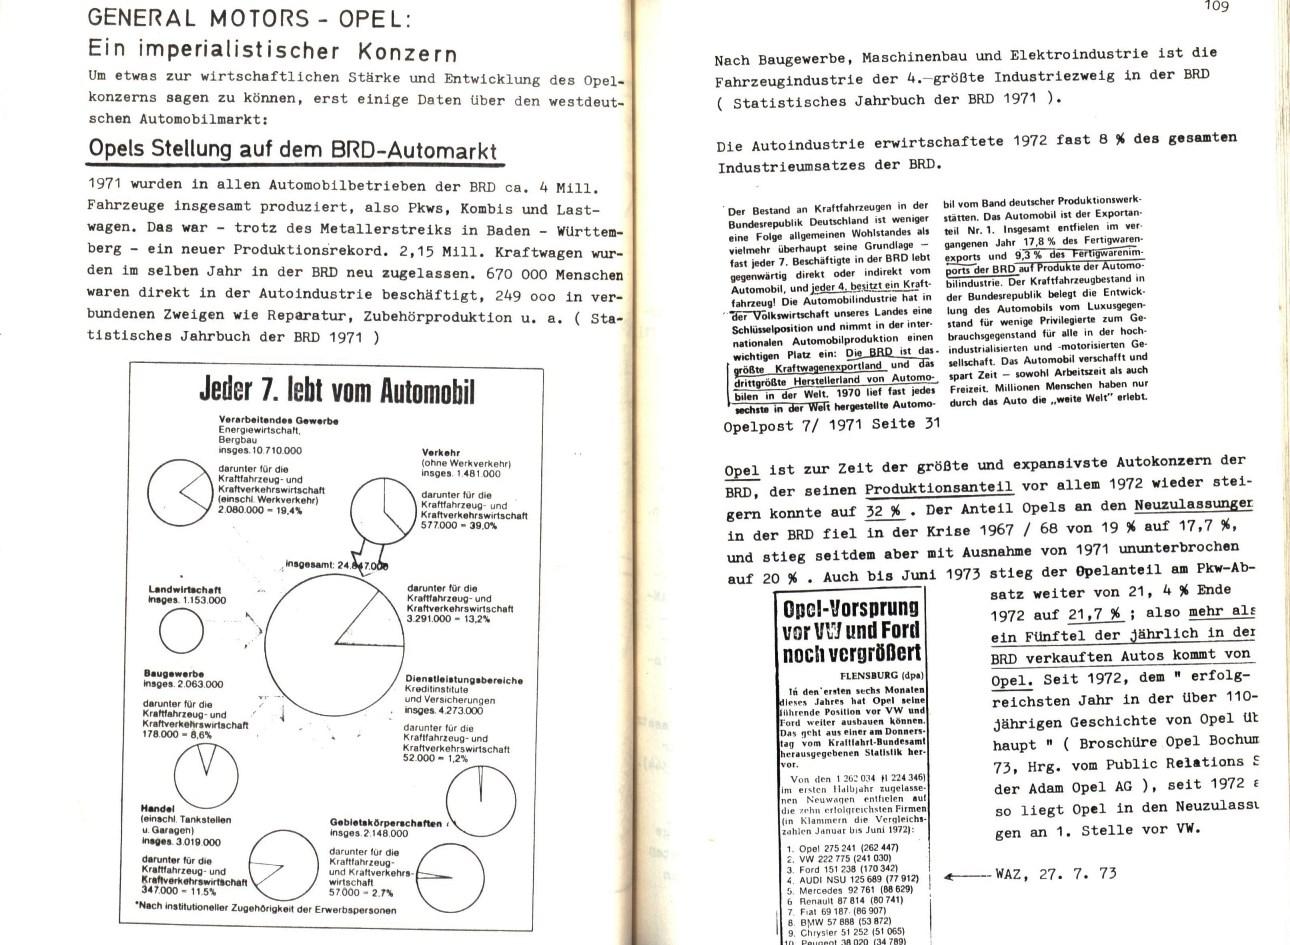 Bochum_IGM_Opel_PG_Opel_streikt_1973_056